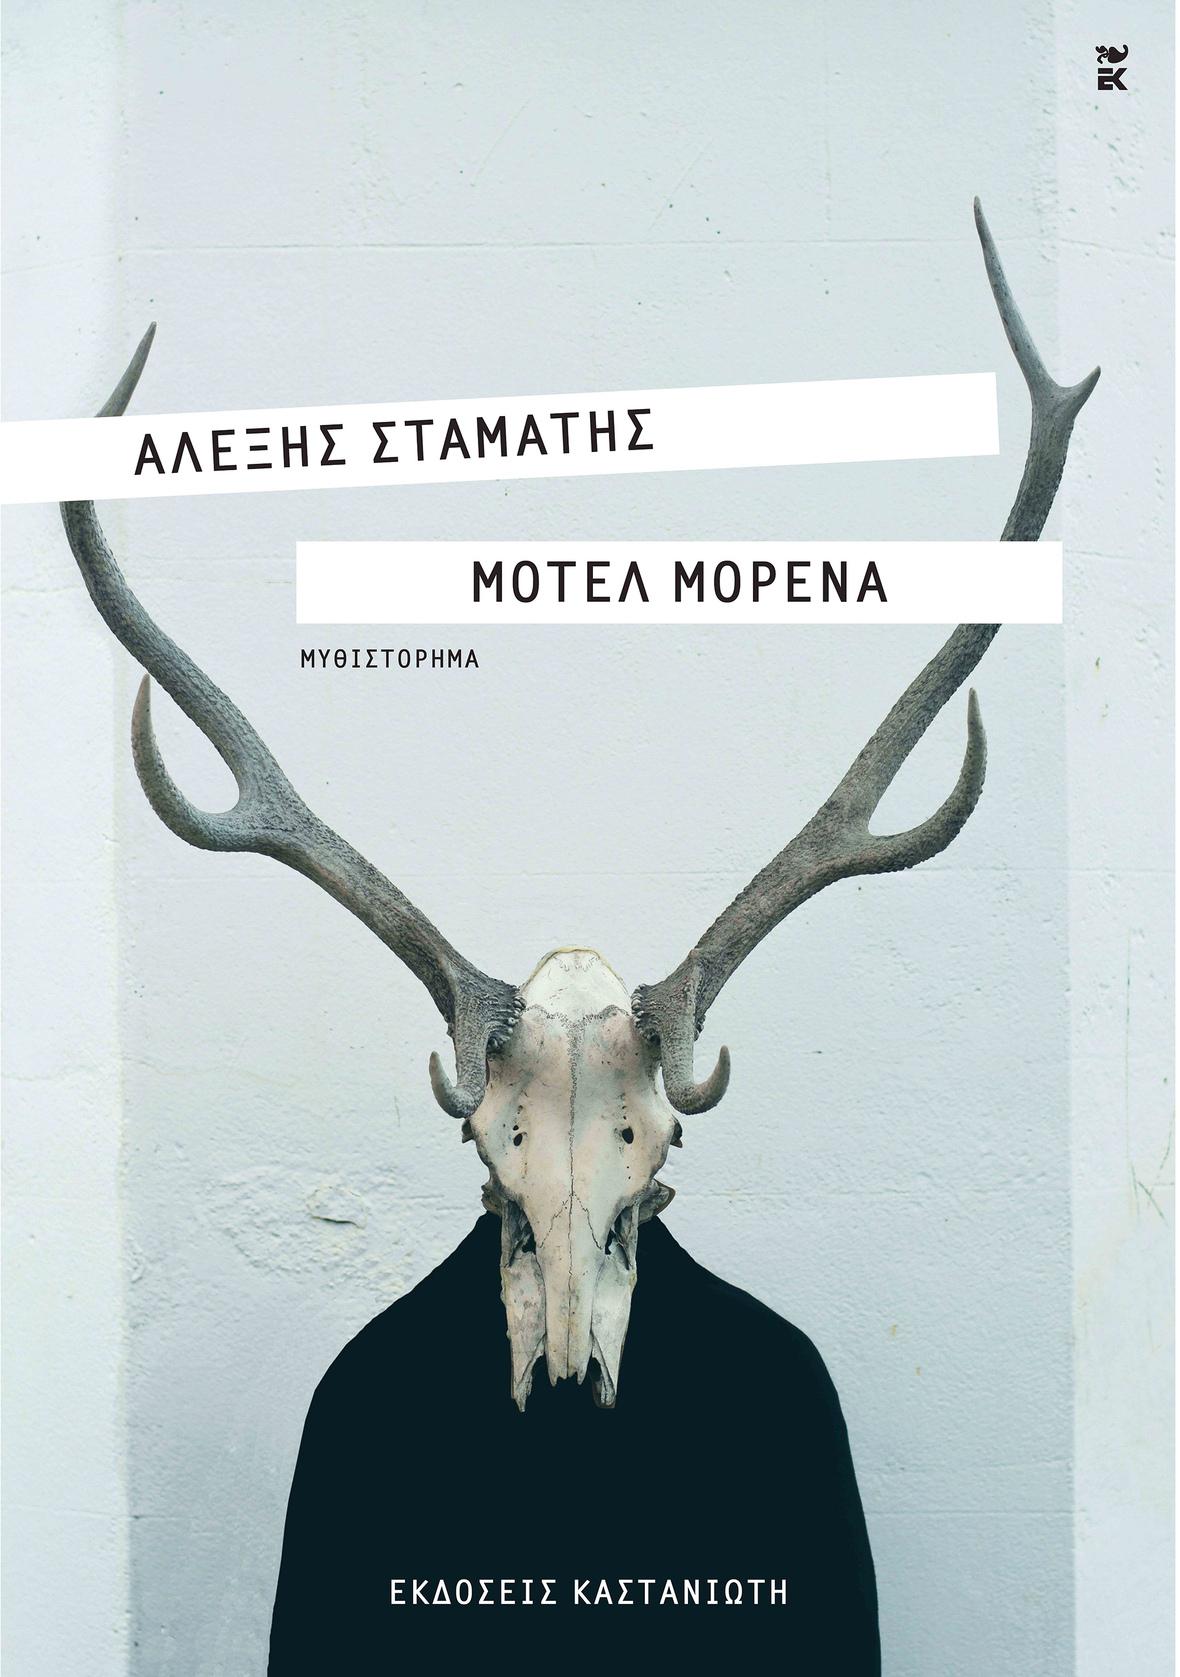 MOTEL MORENA - EXWFYLLO